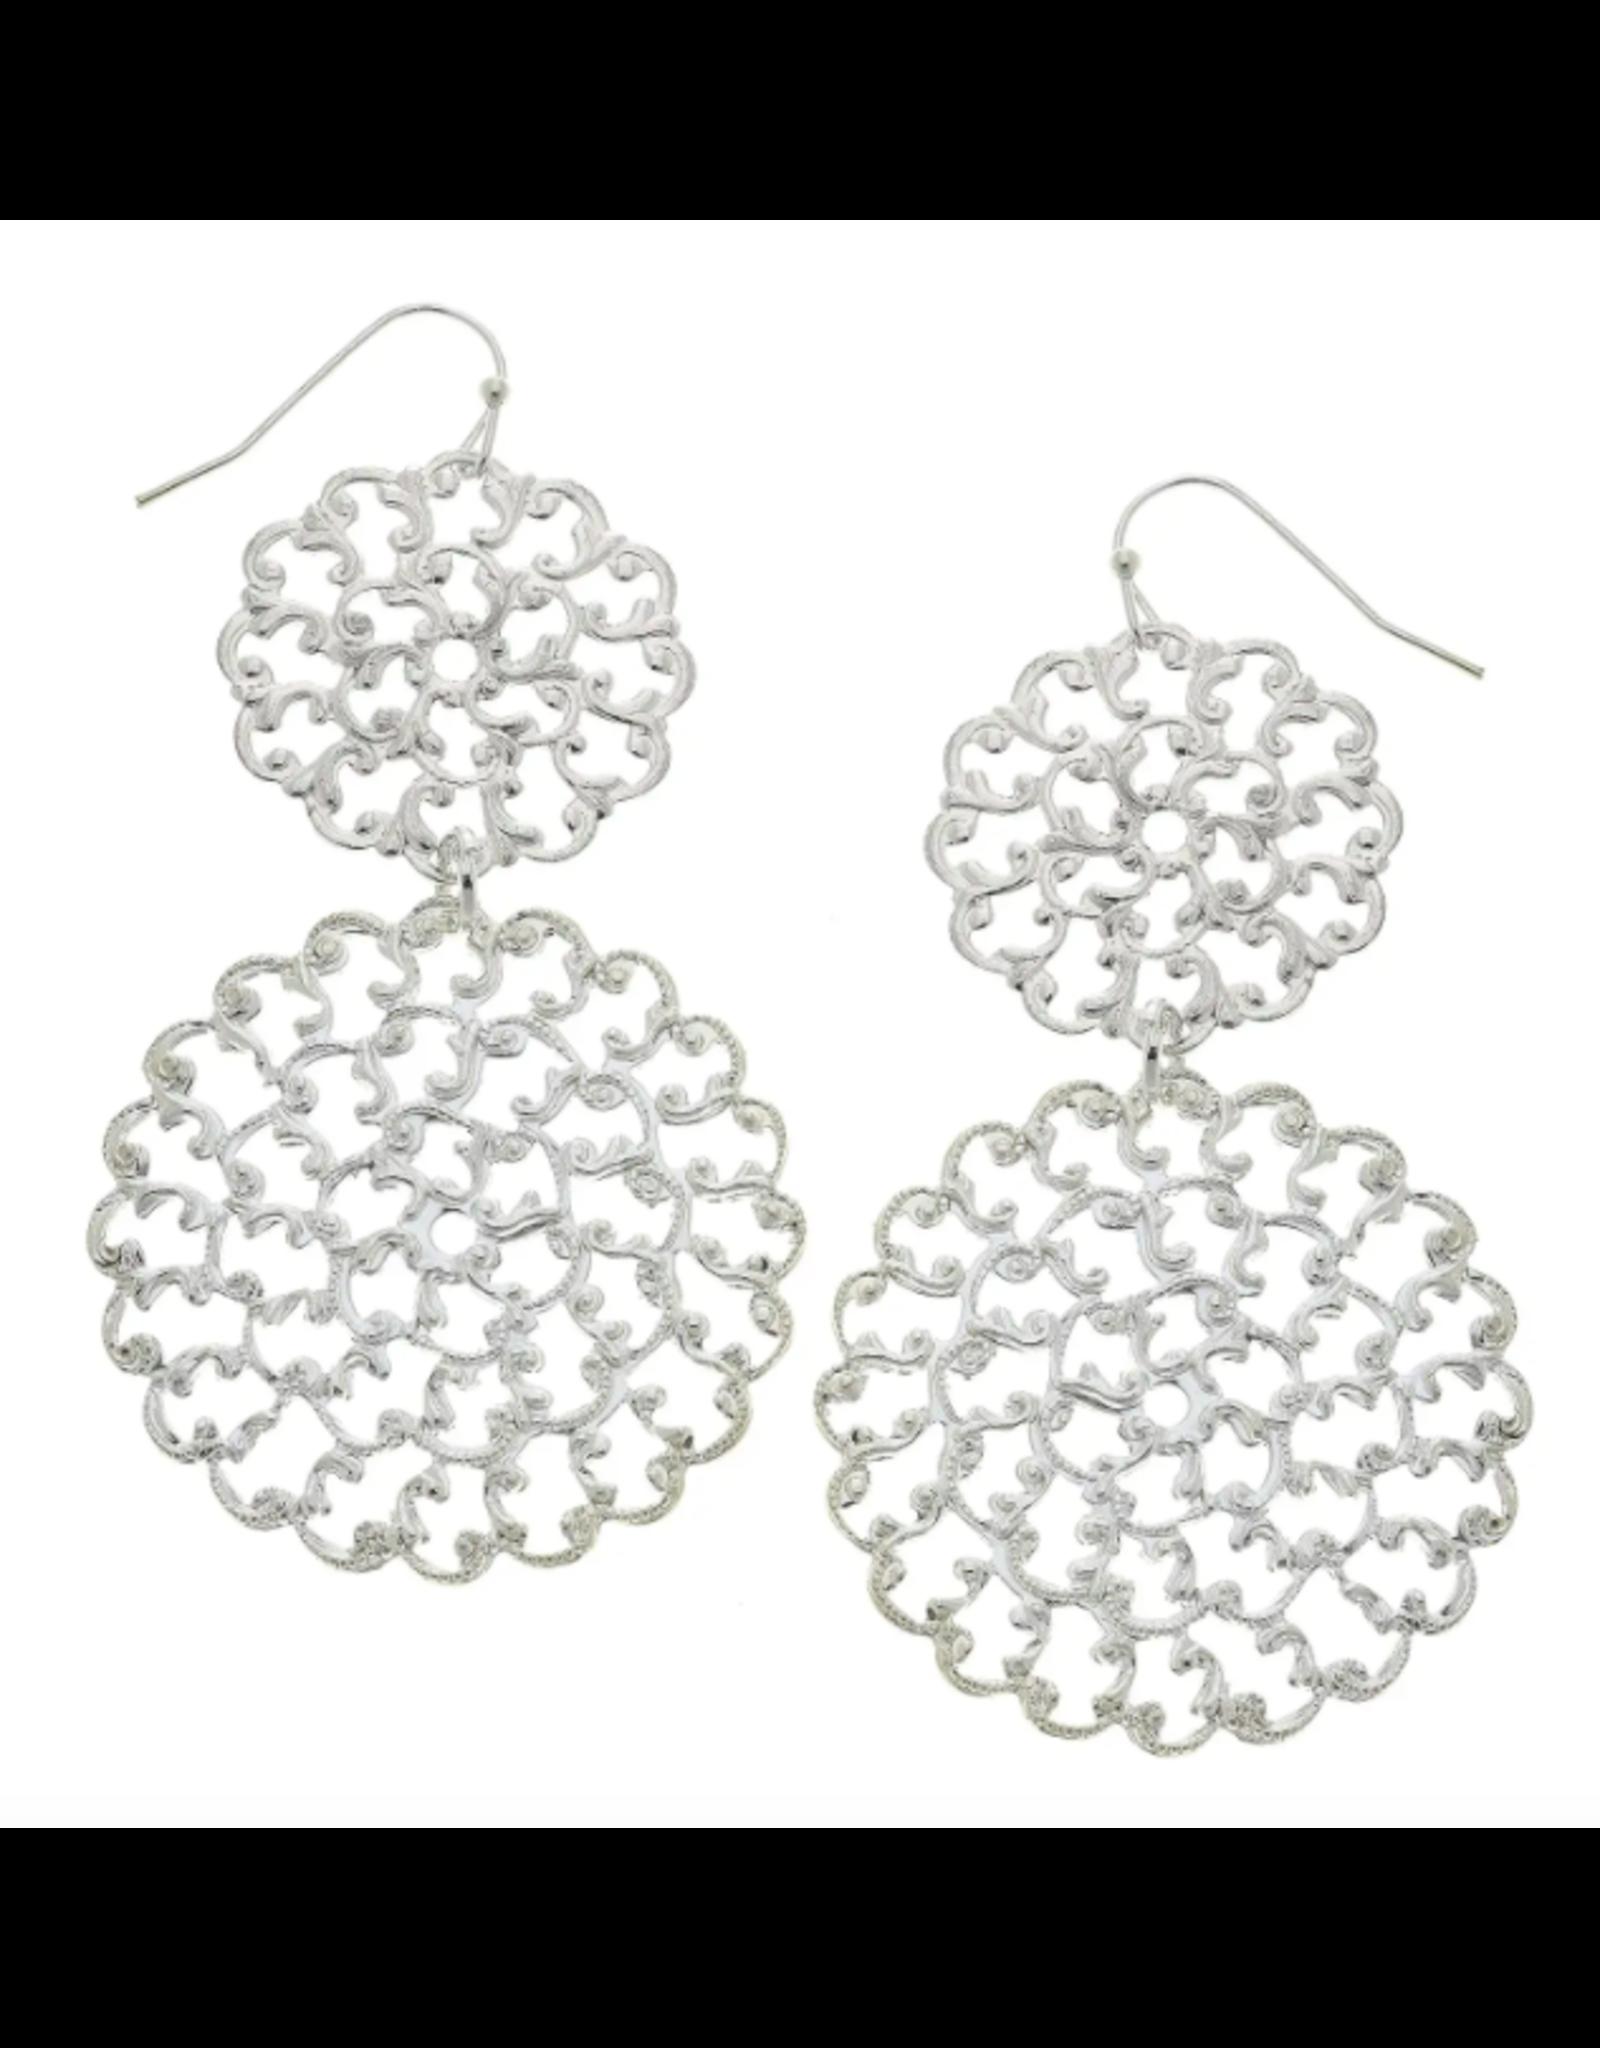 Susan Shaw Double Filigree Earrings in Silver by Susan Shaw